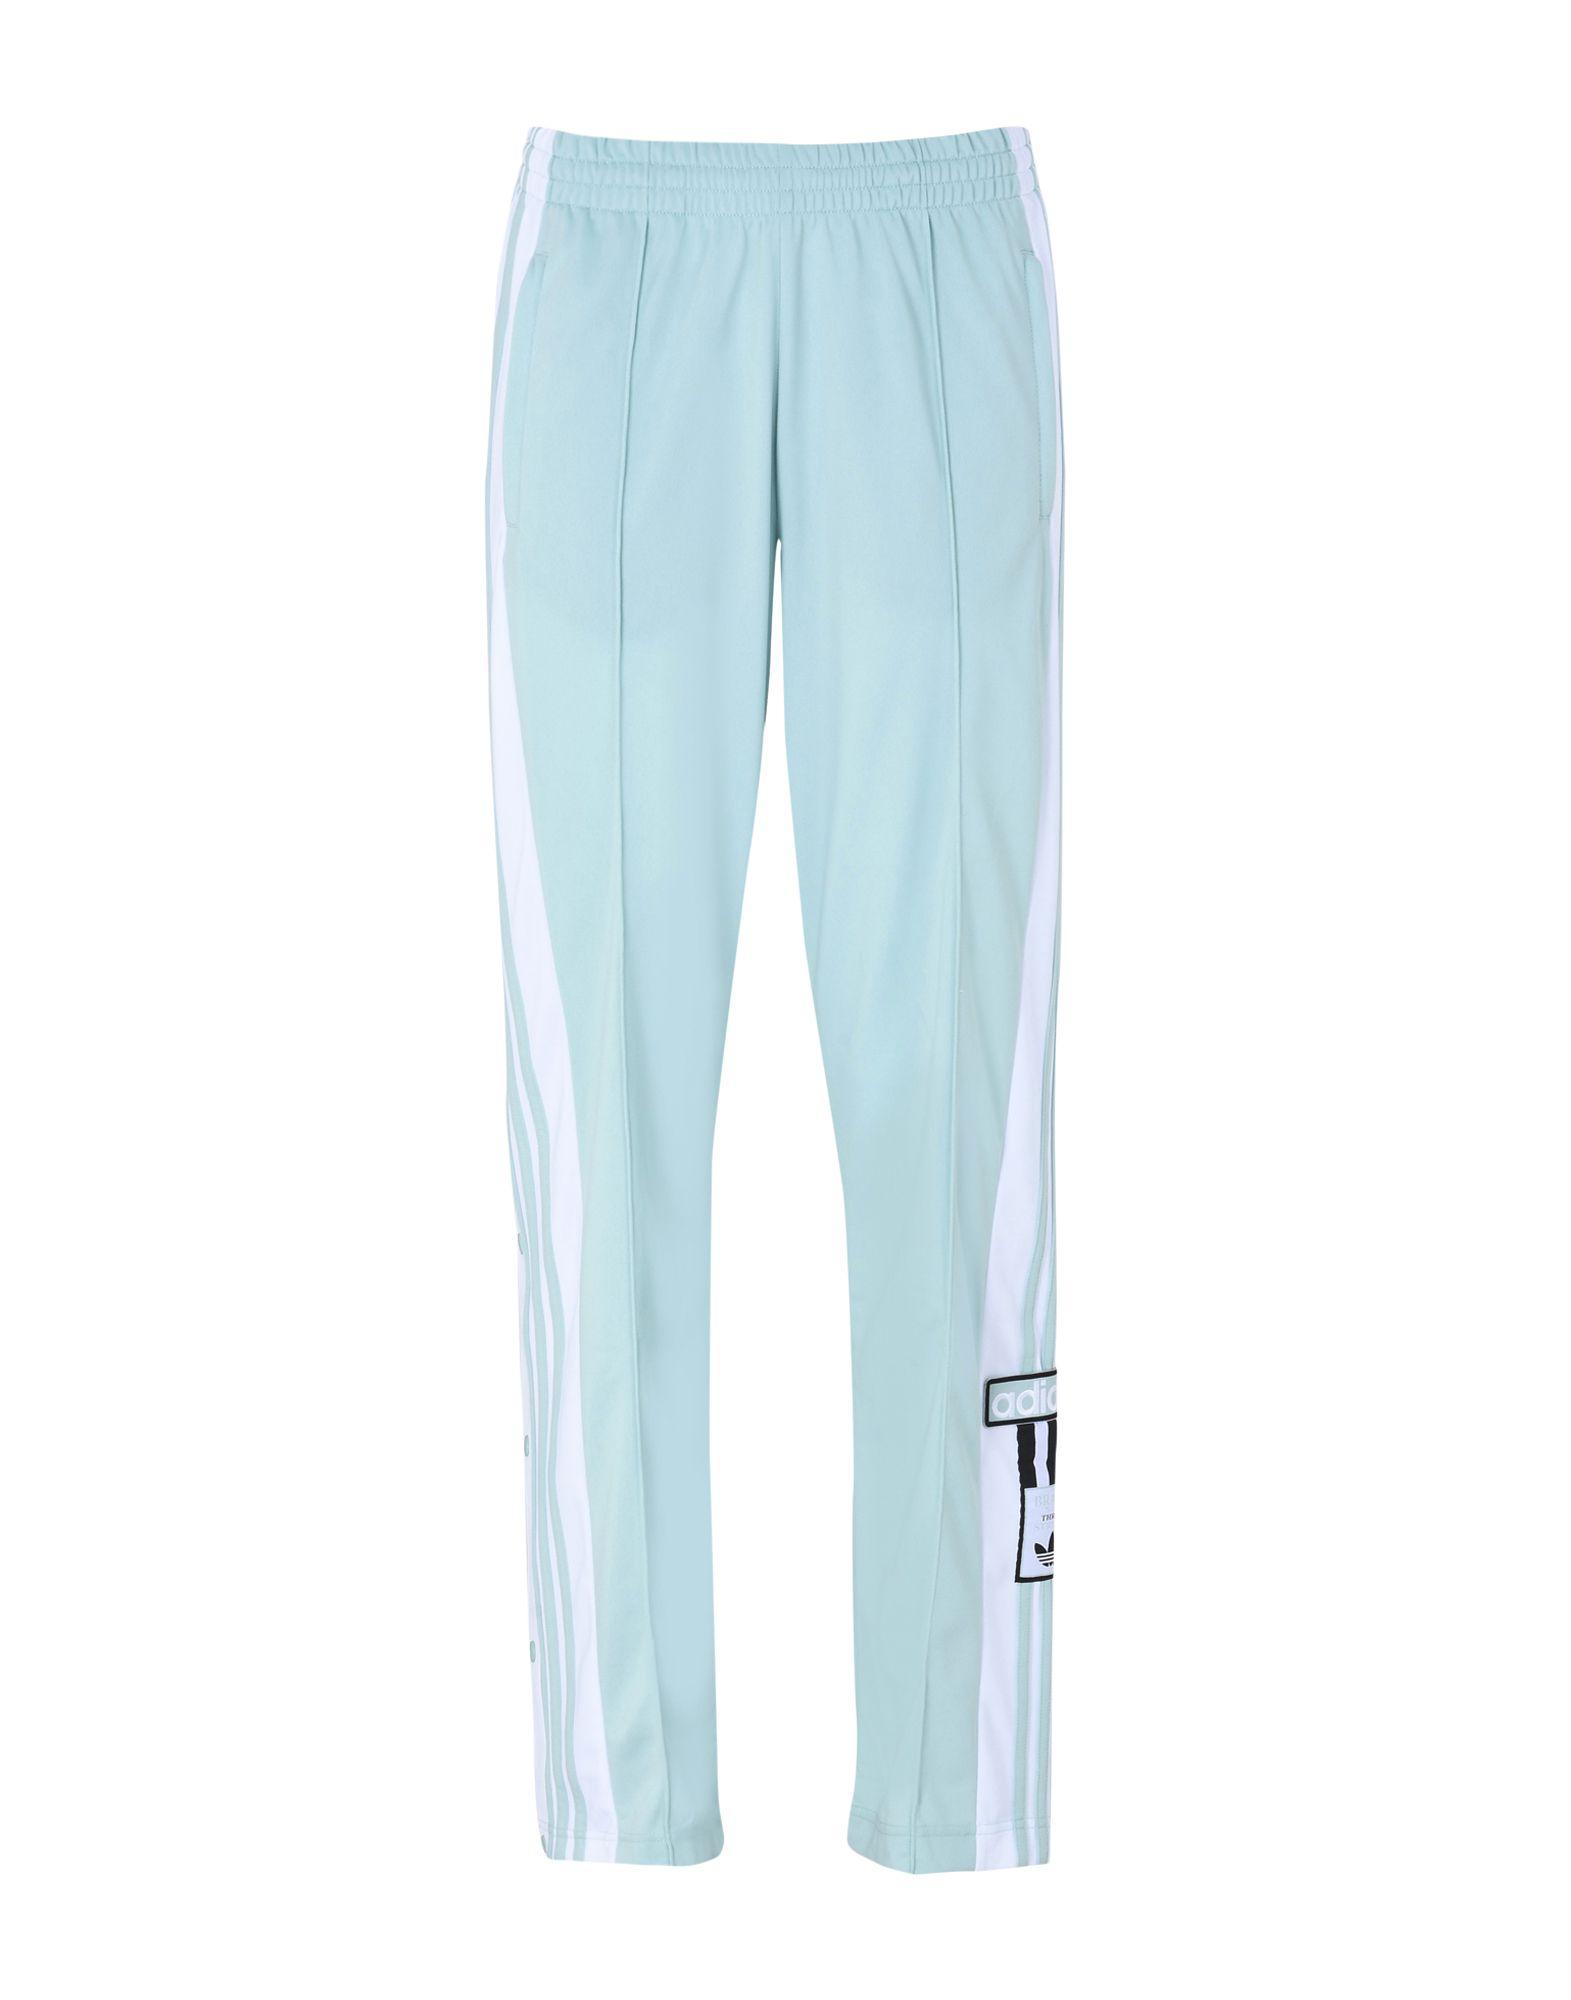 ADIDAS ORIGINALS - Pantalone